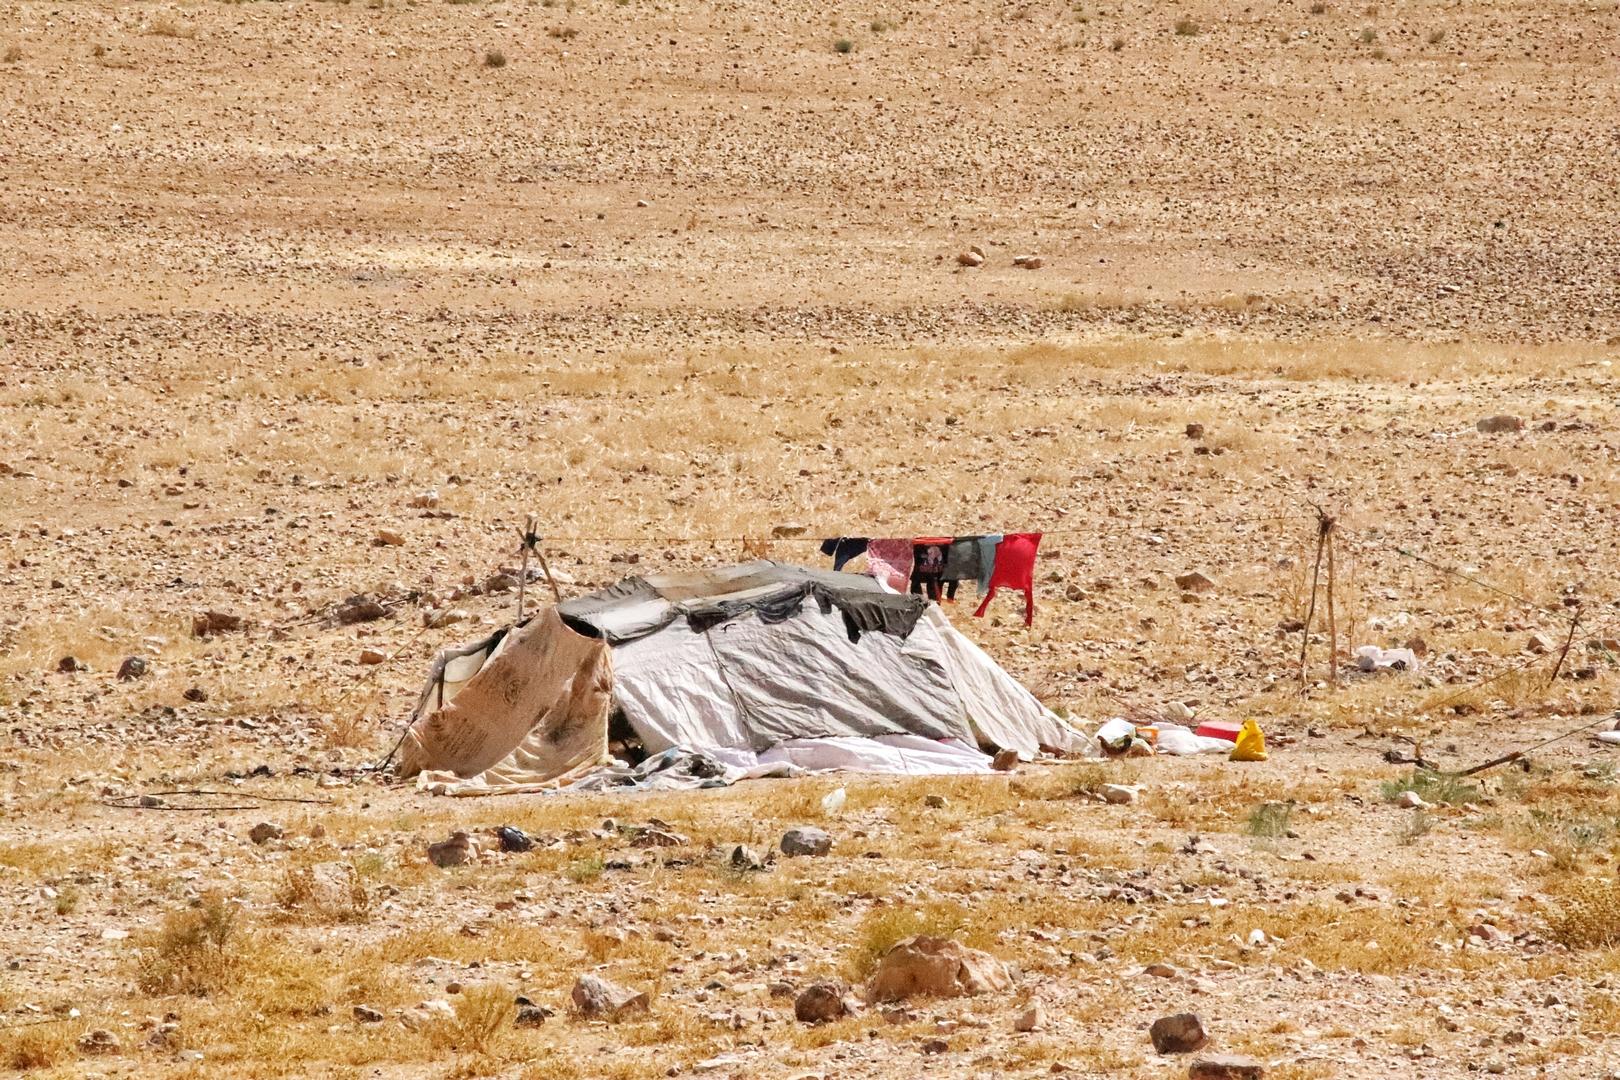 Jordanie - Campement bédouin